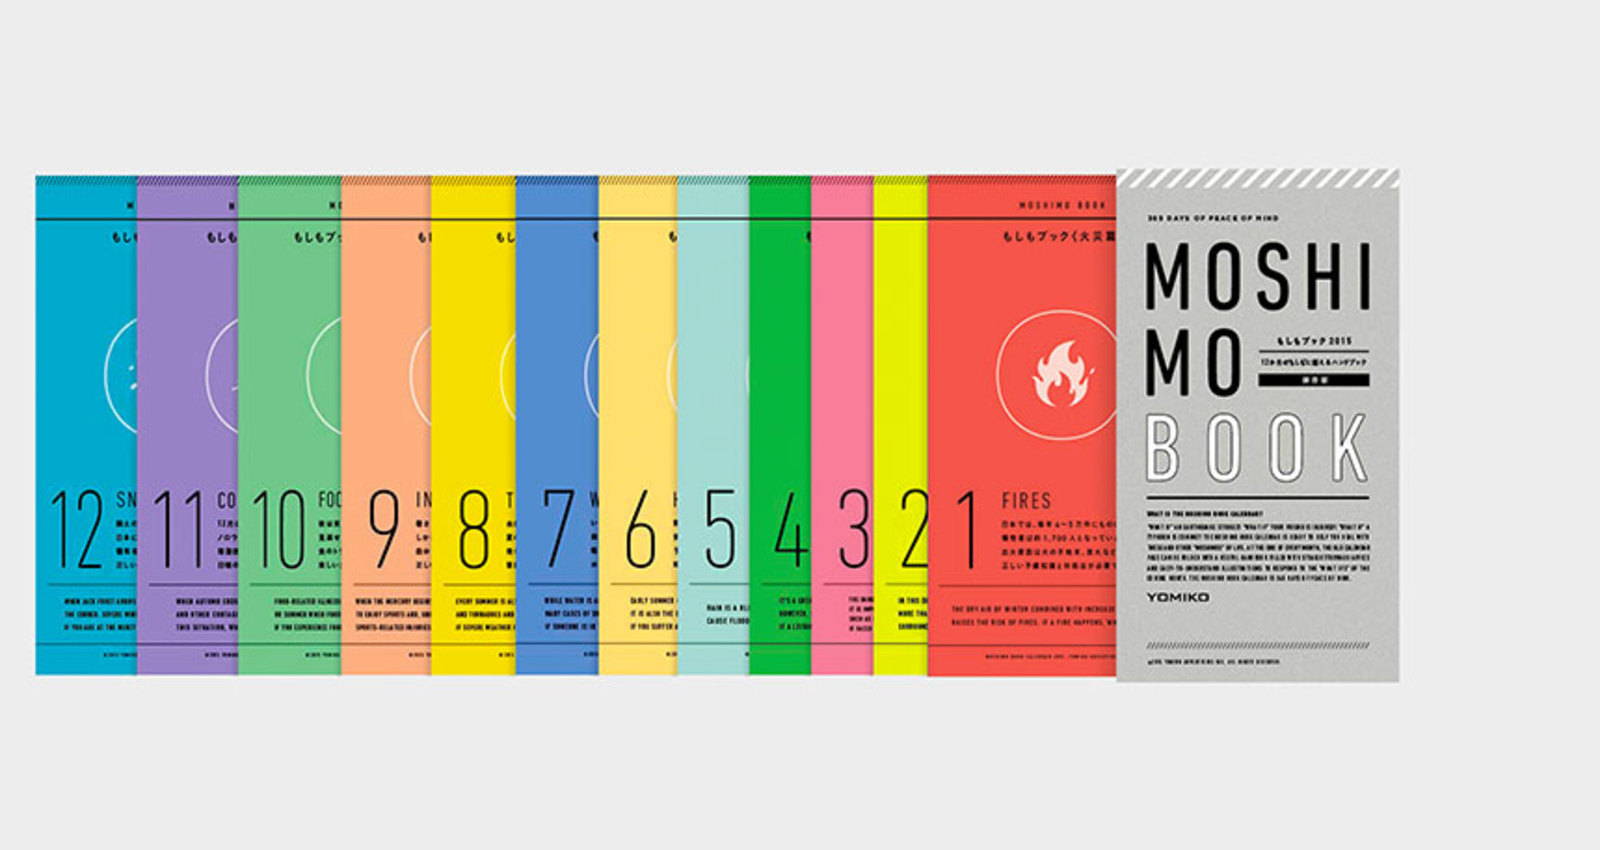 MOSHIMO BOOK CALENDAR